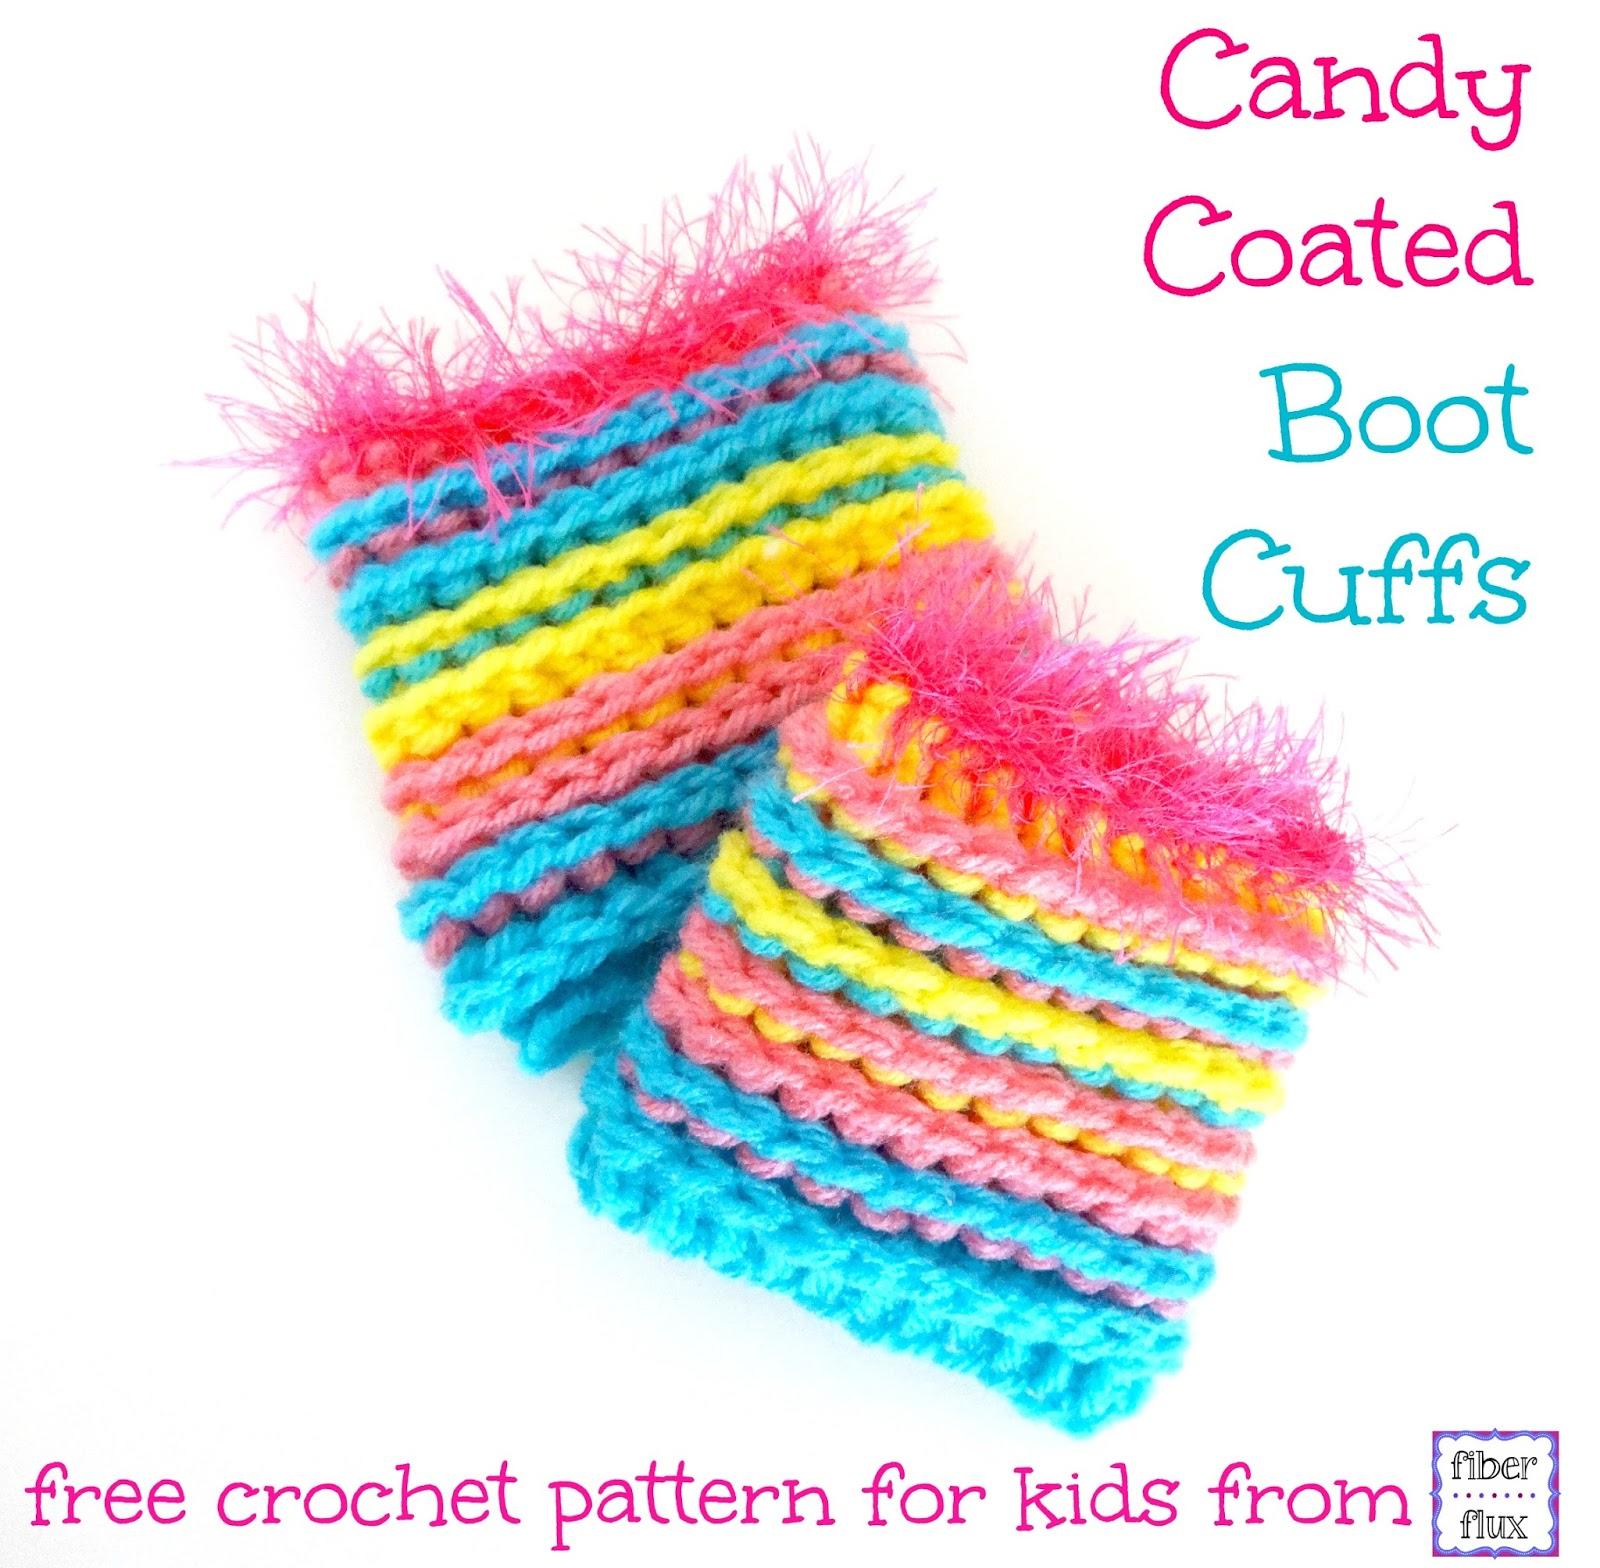 Fiber flux free crochet patternndy coated boot cuffs free crochet patternndy coated boot cuffs bankloansurffo Images